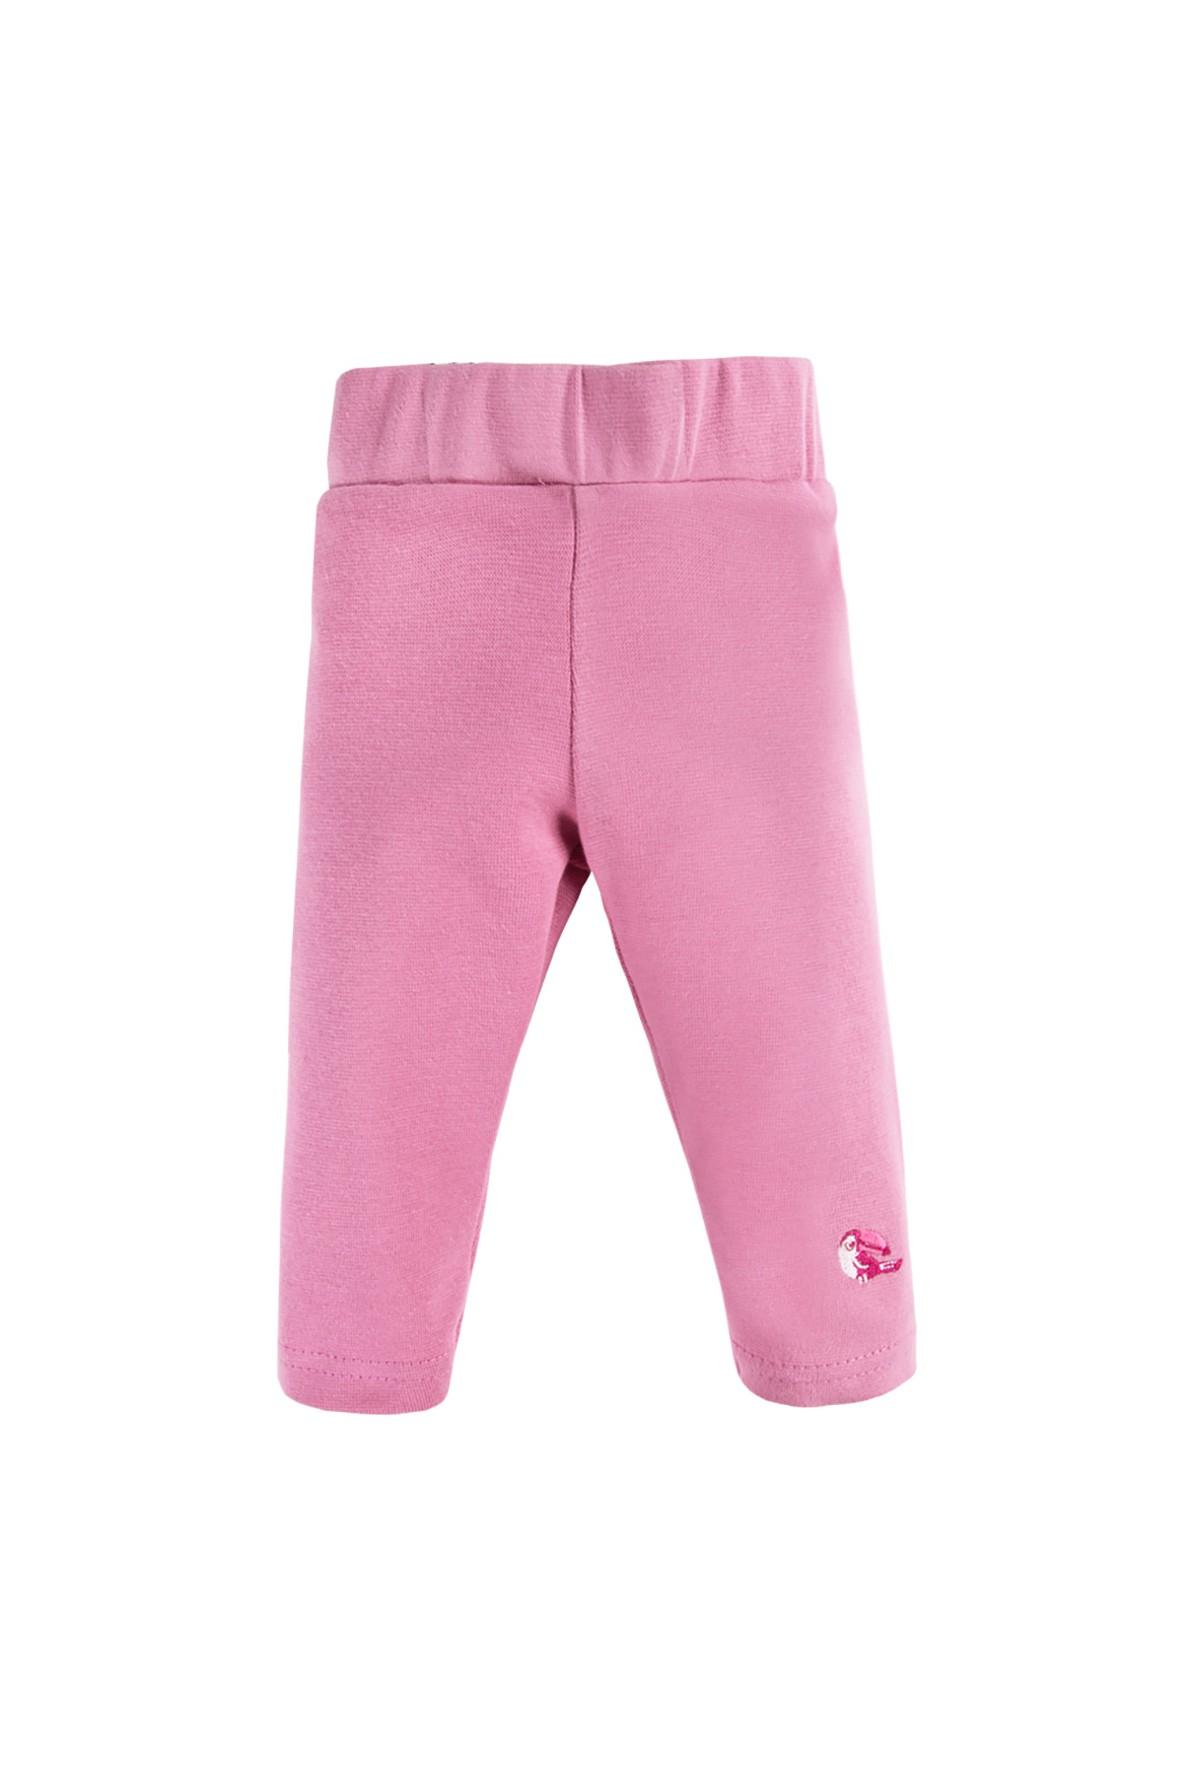 Leginsy niemowlęce NATURE różowe